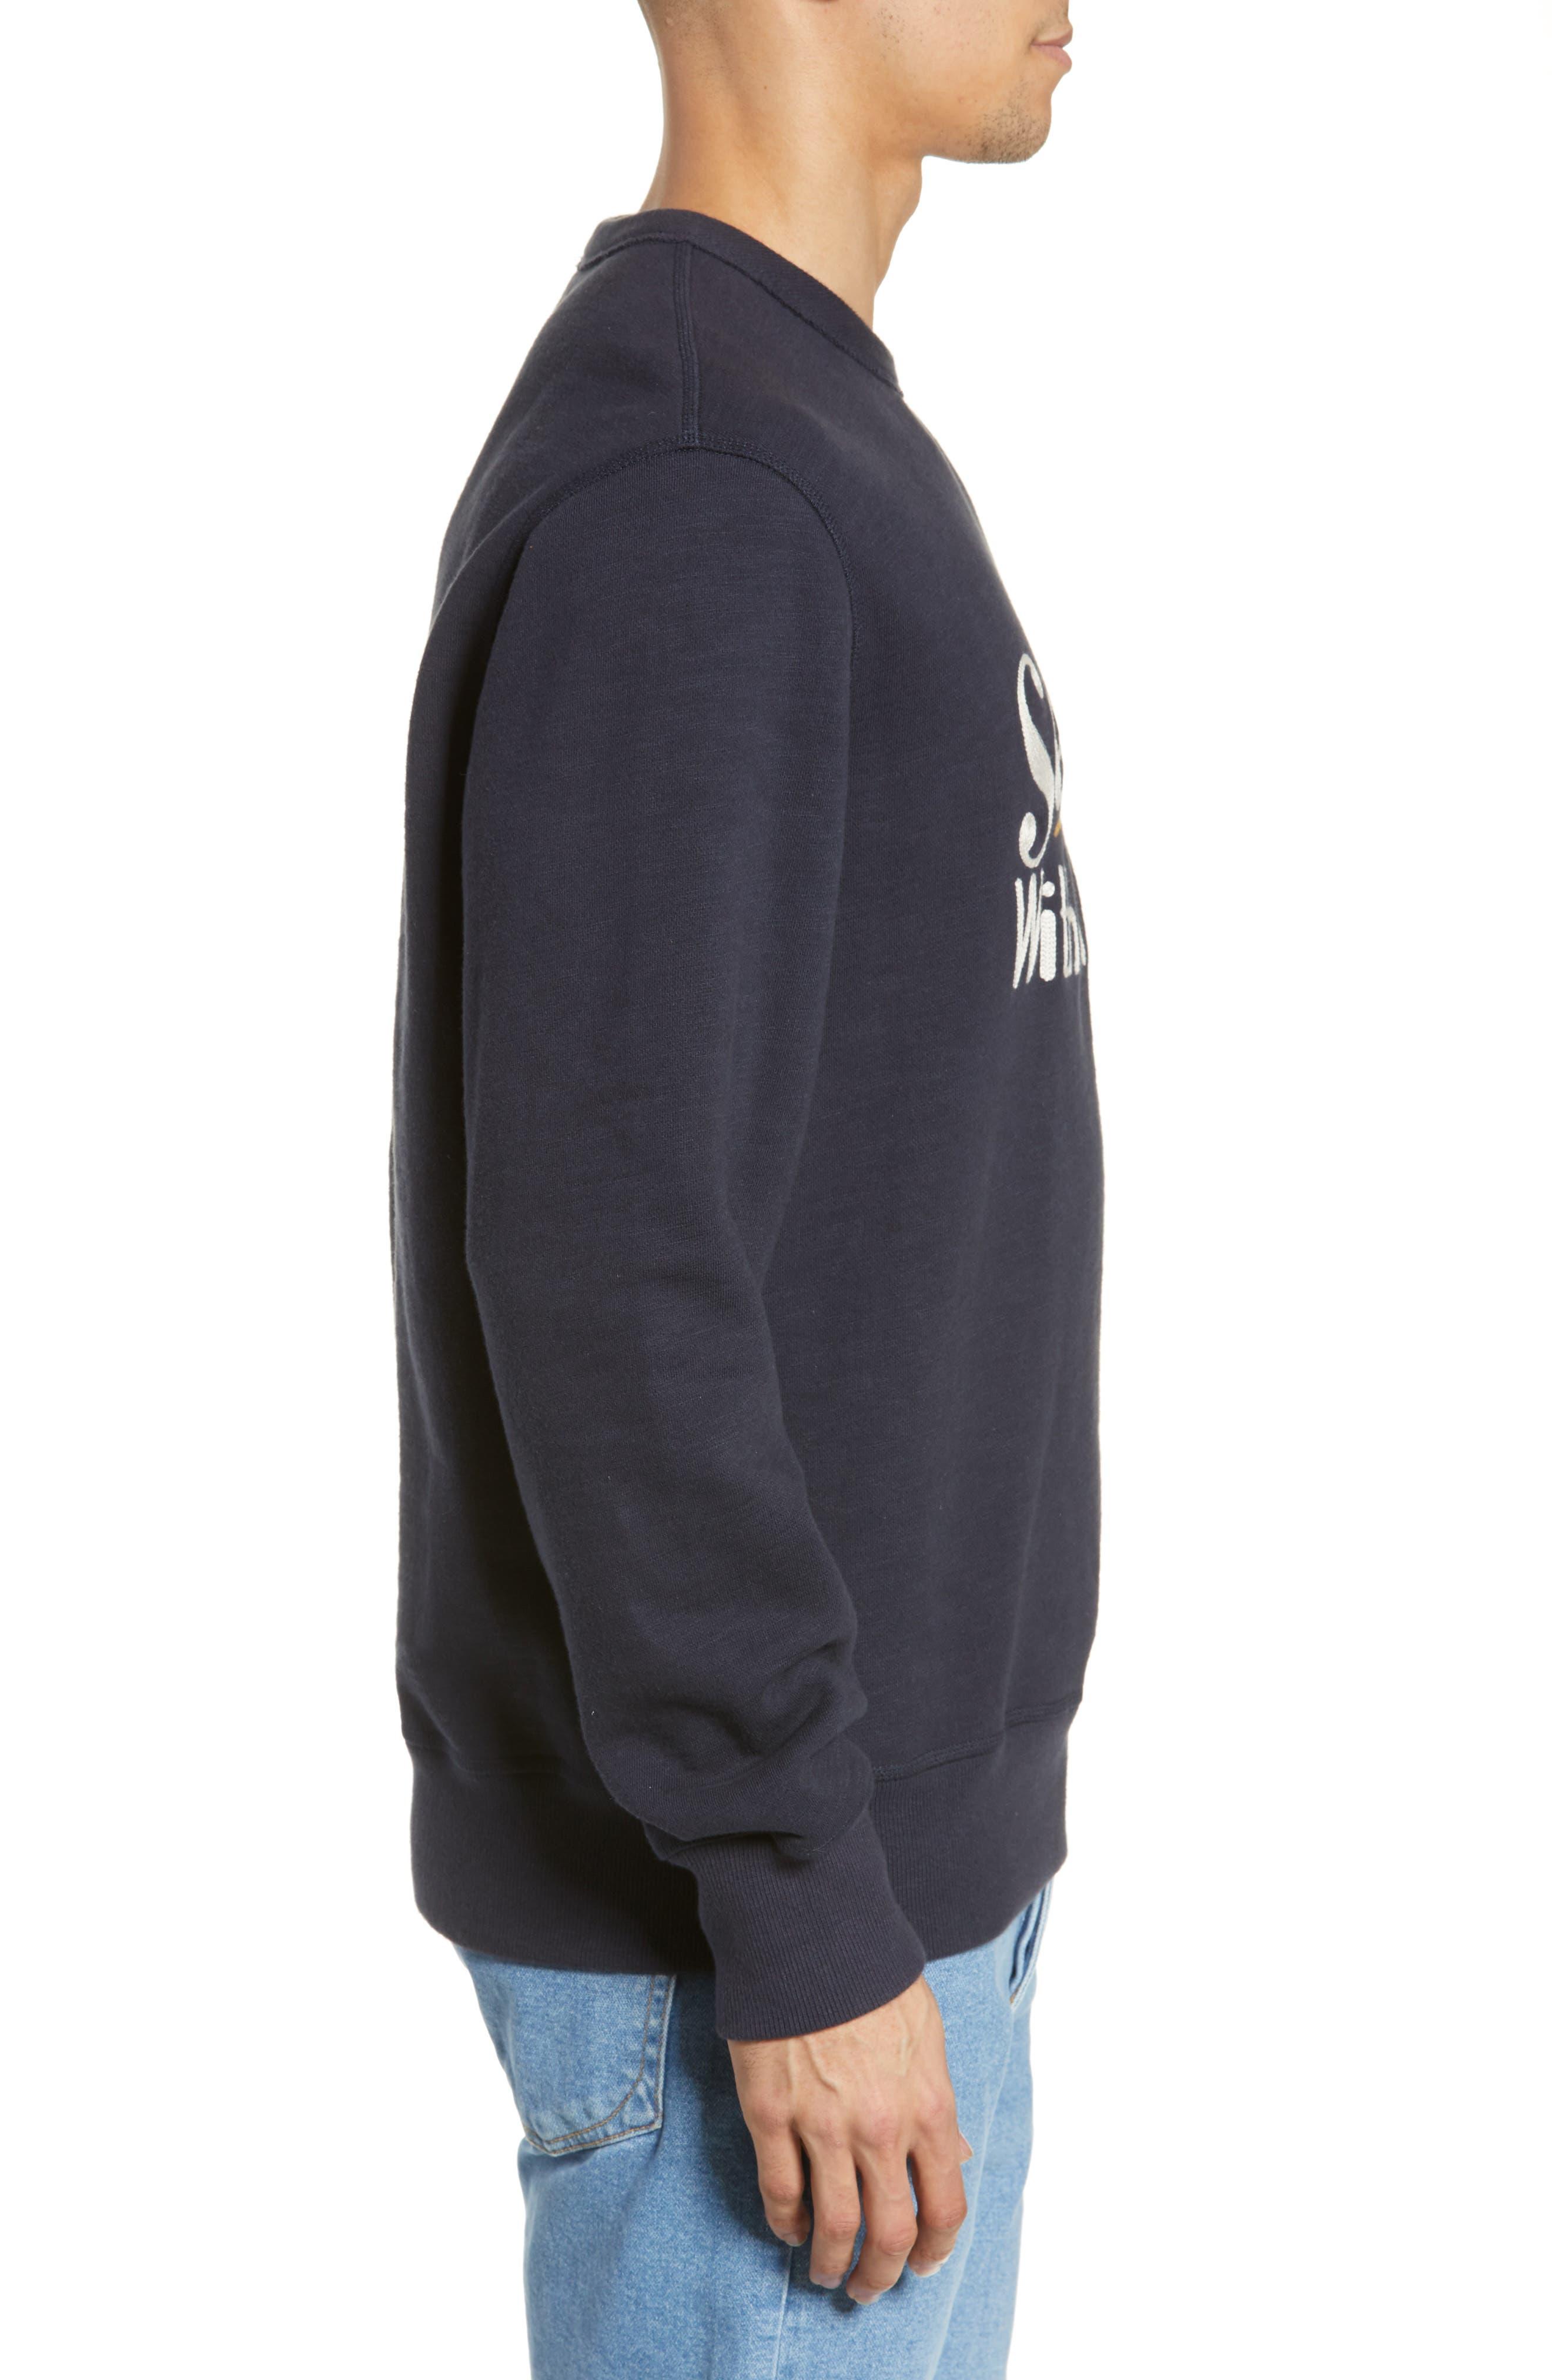 RAG & BONE, Graphic Embroidered Sweatshirt, Alternate thumbnail 3, color, NAVY